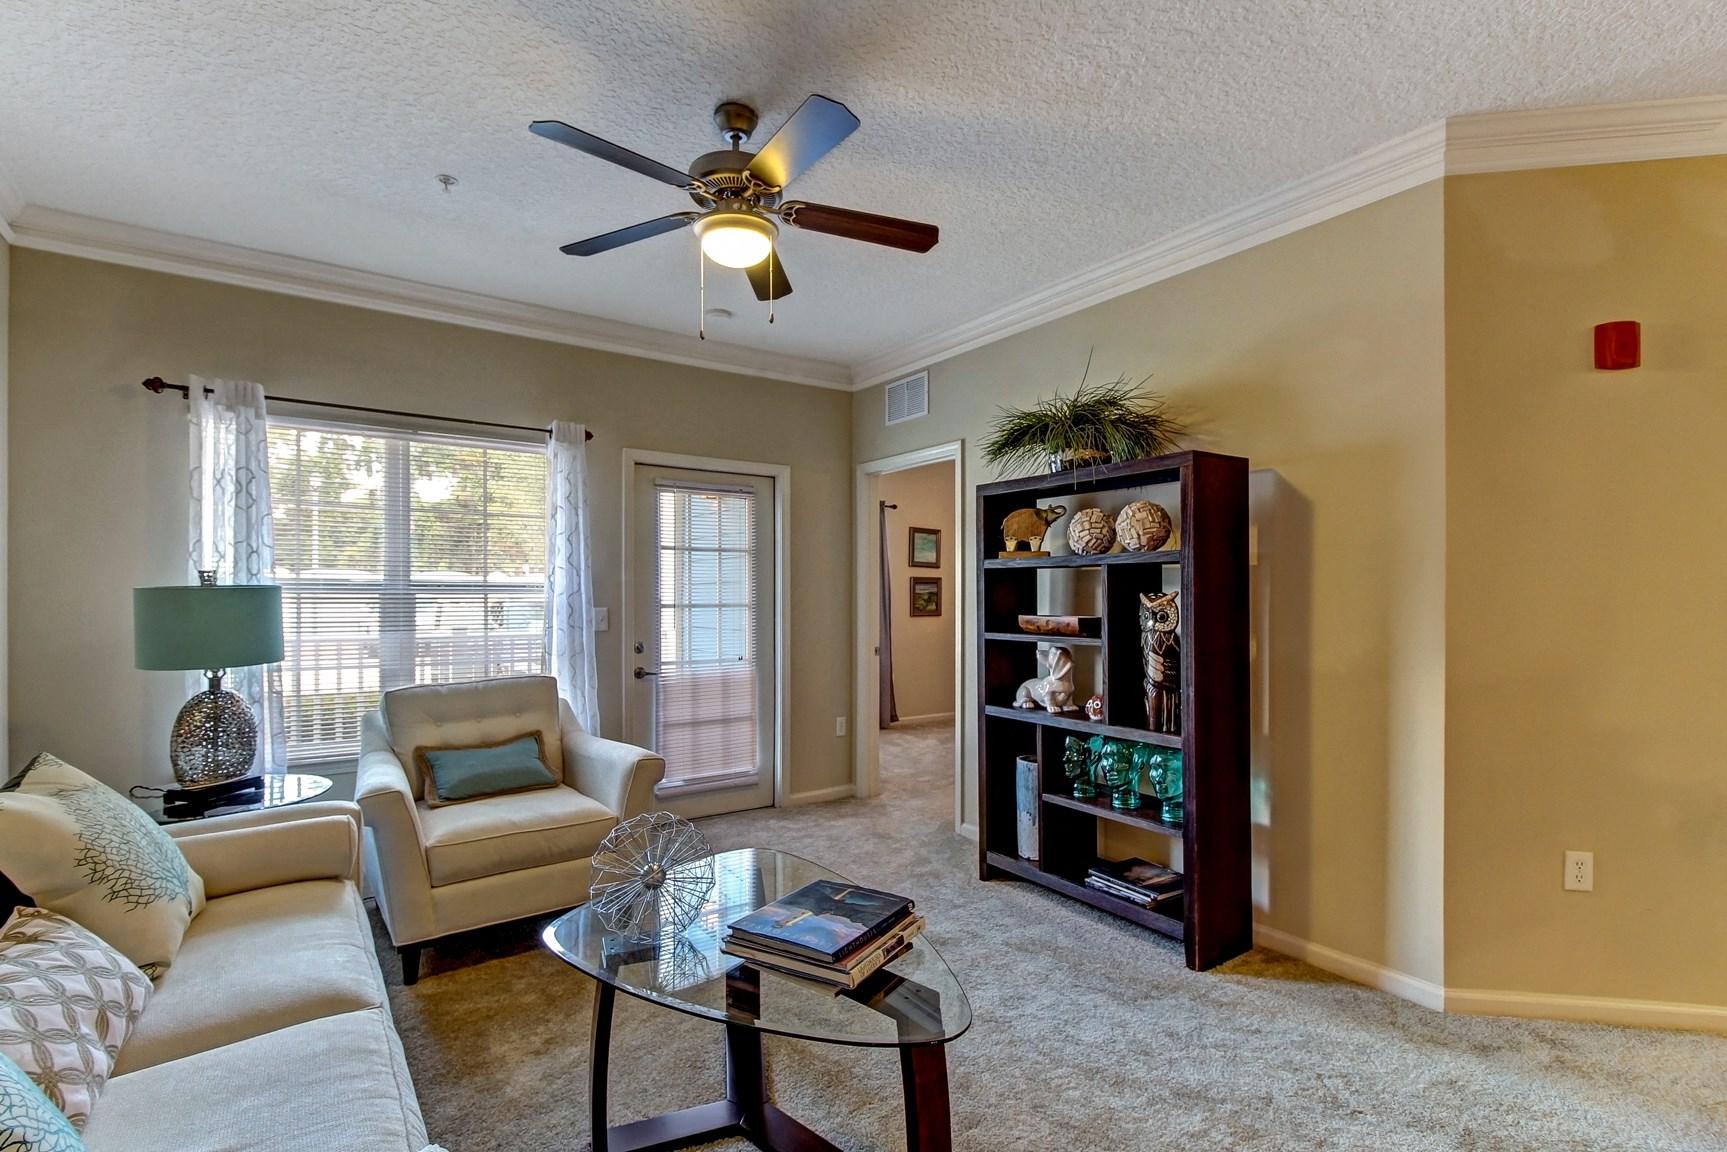 Living Room at Magnolia Village Apartments in Jacksonville, FL